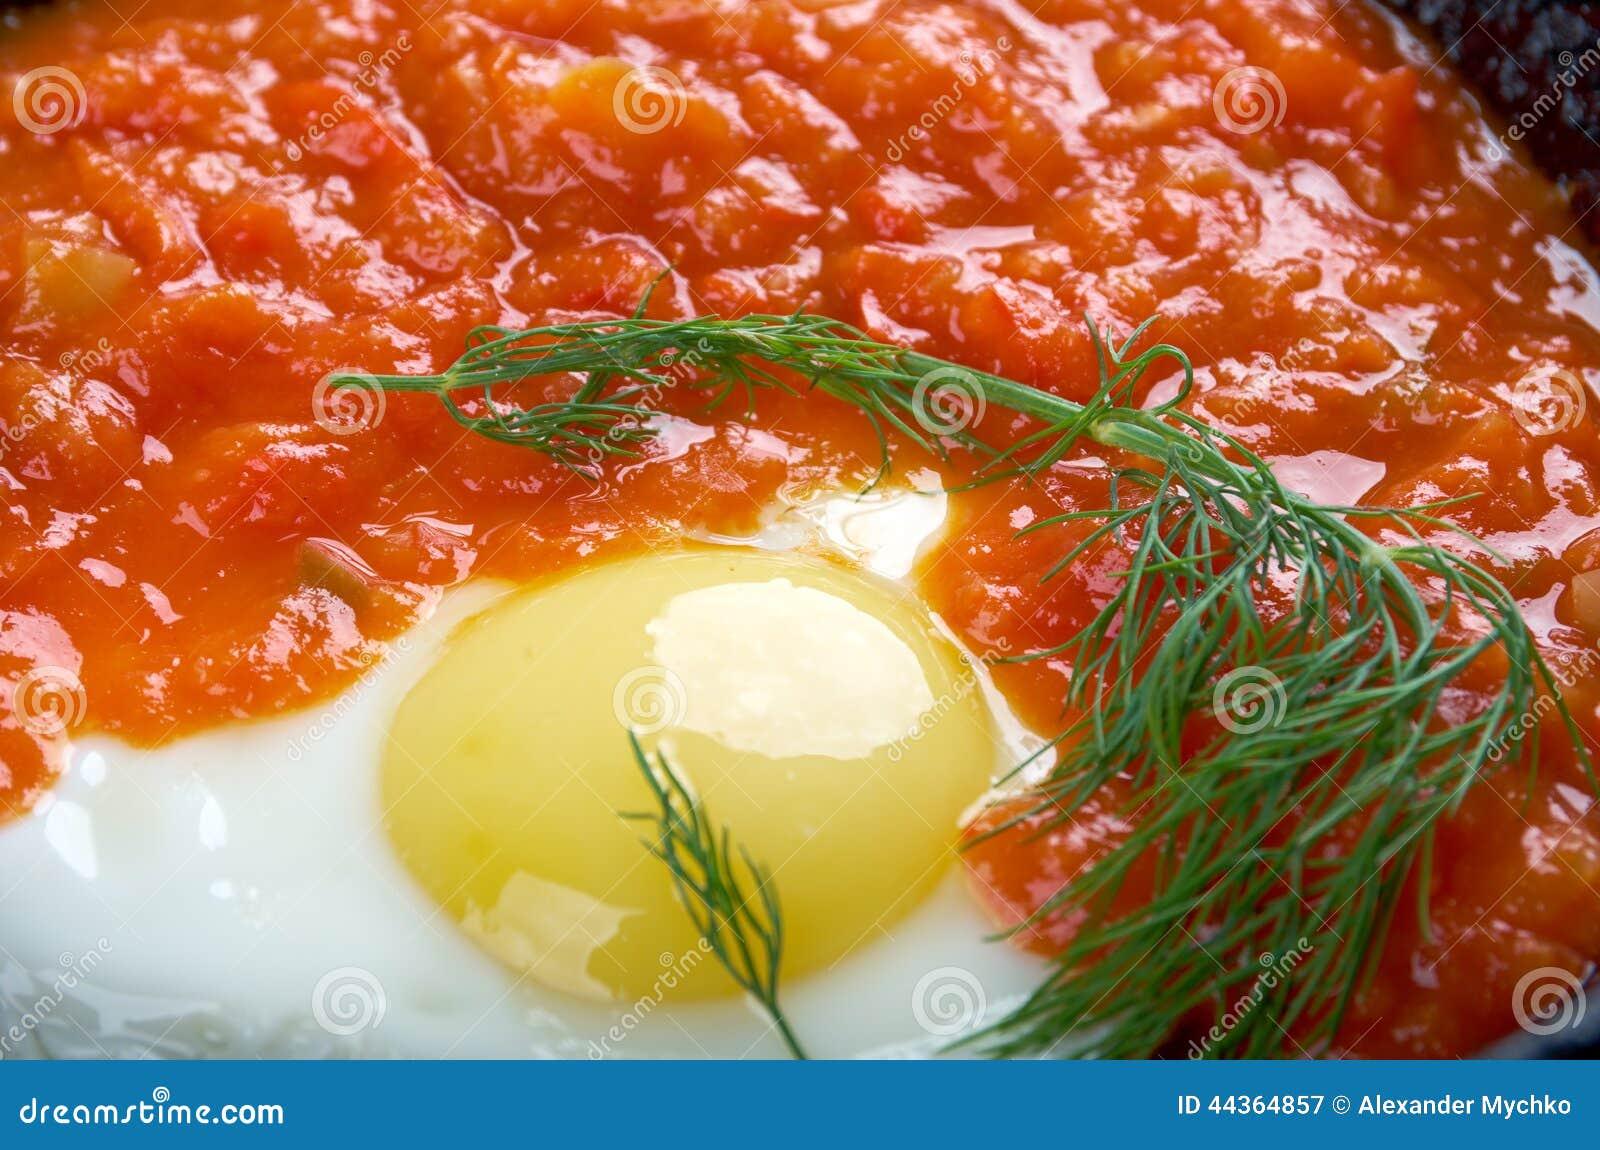 Matbucha ed uova rimescolate